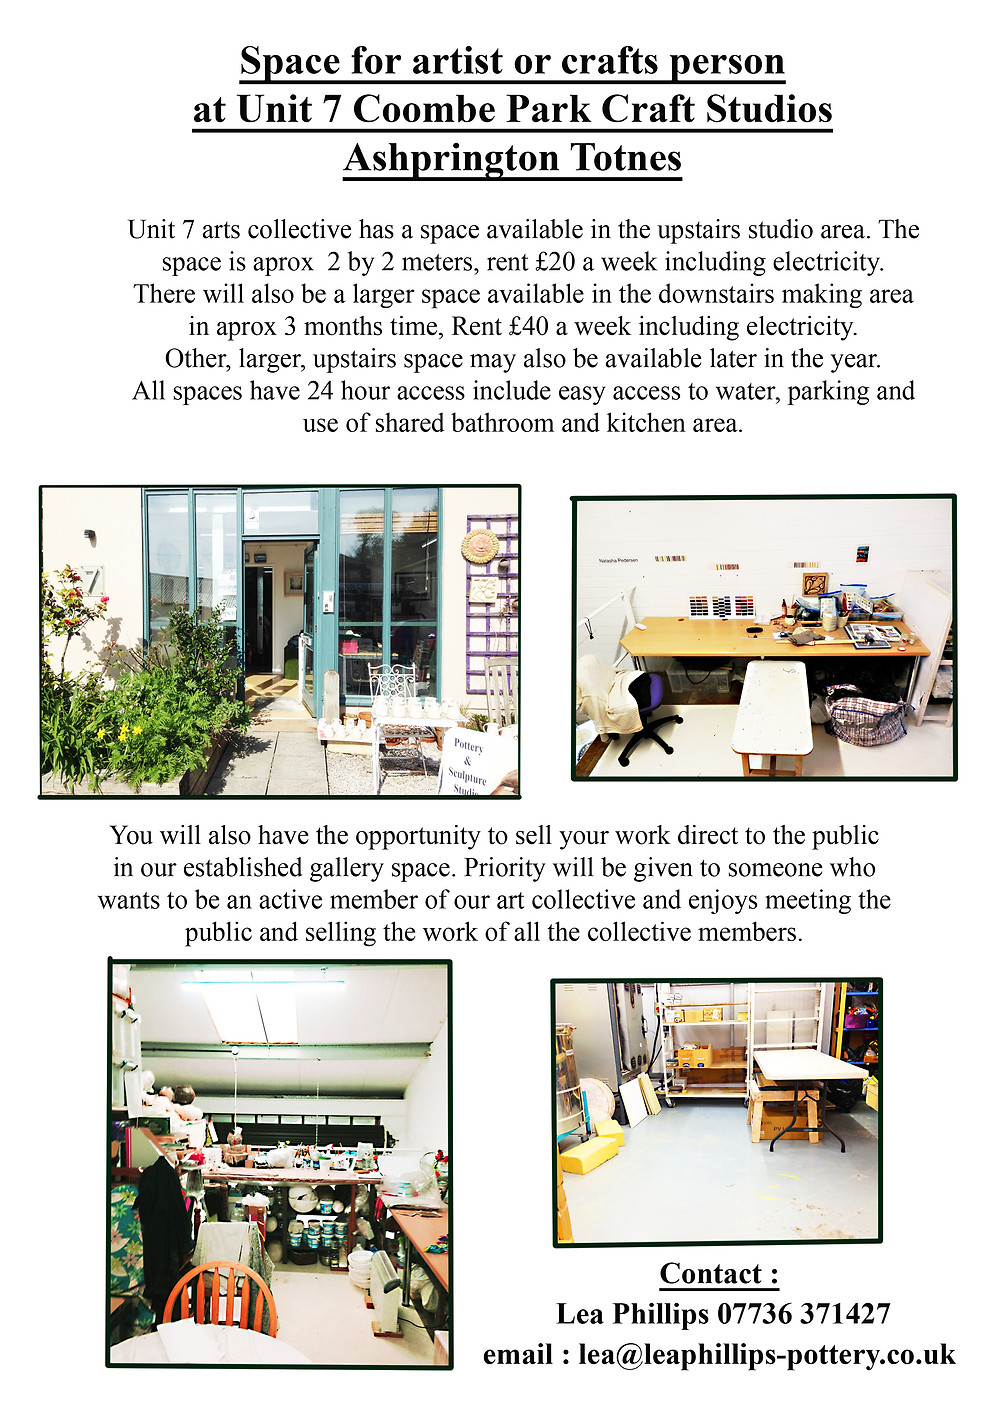 2 artists studio spaces near Totnes, South Devon.